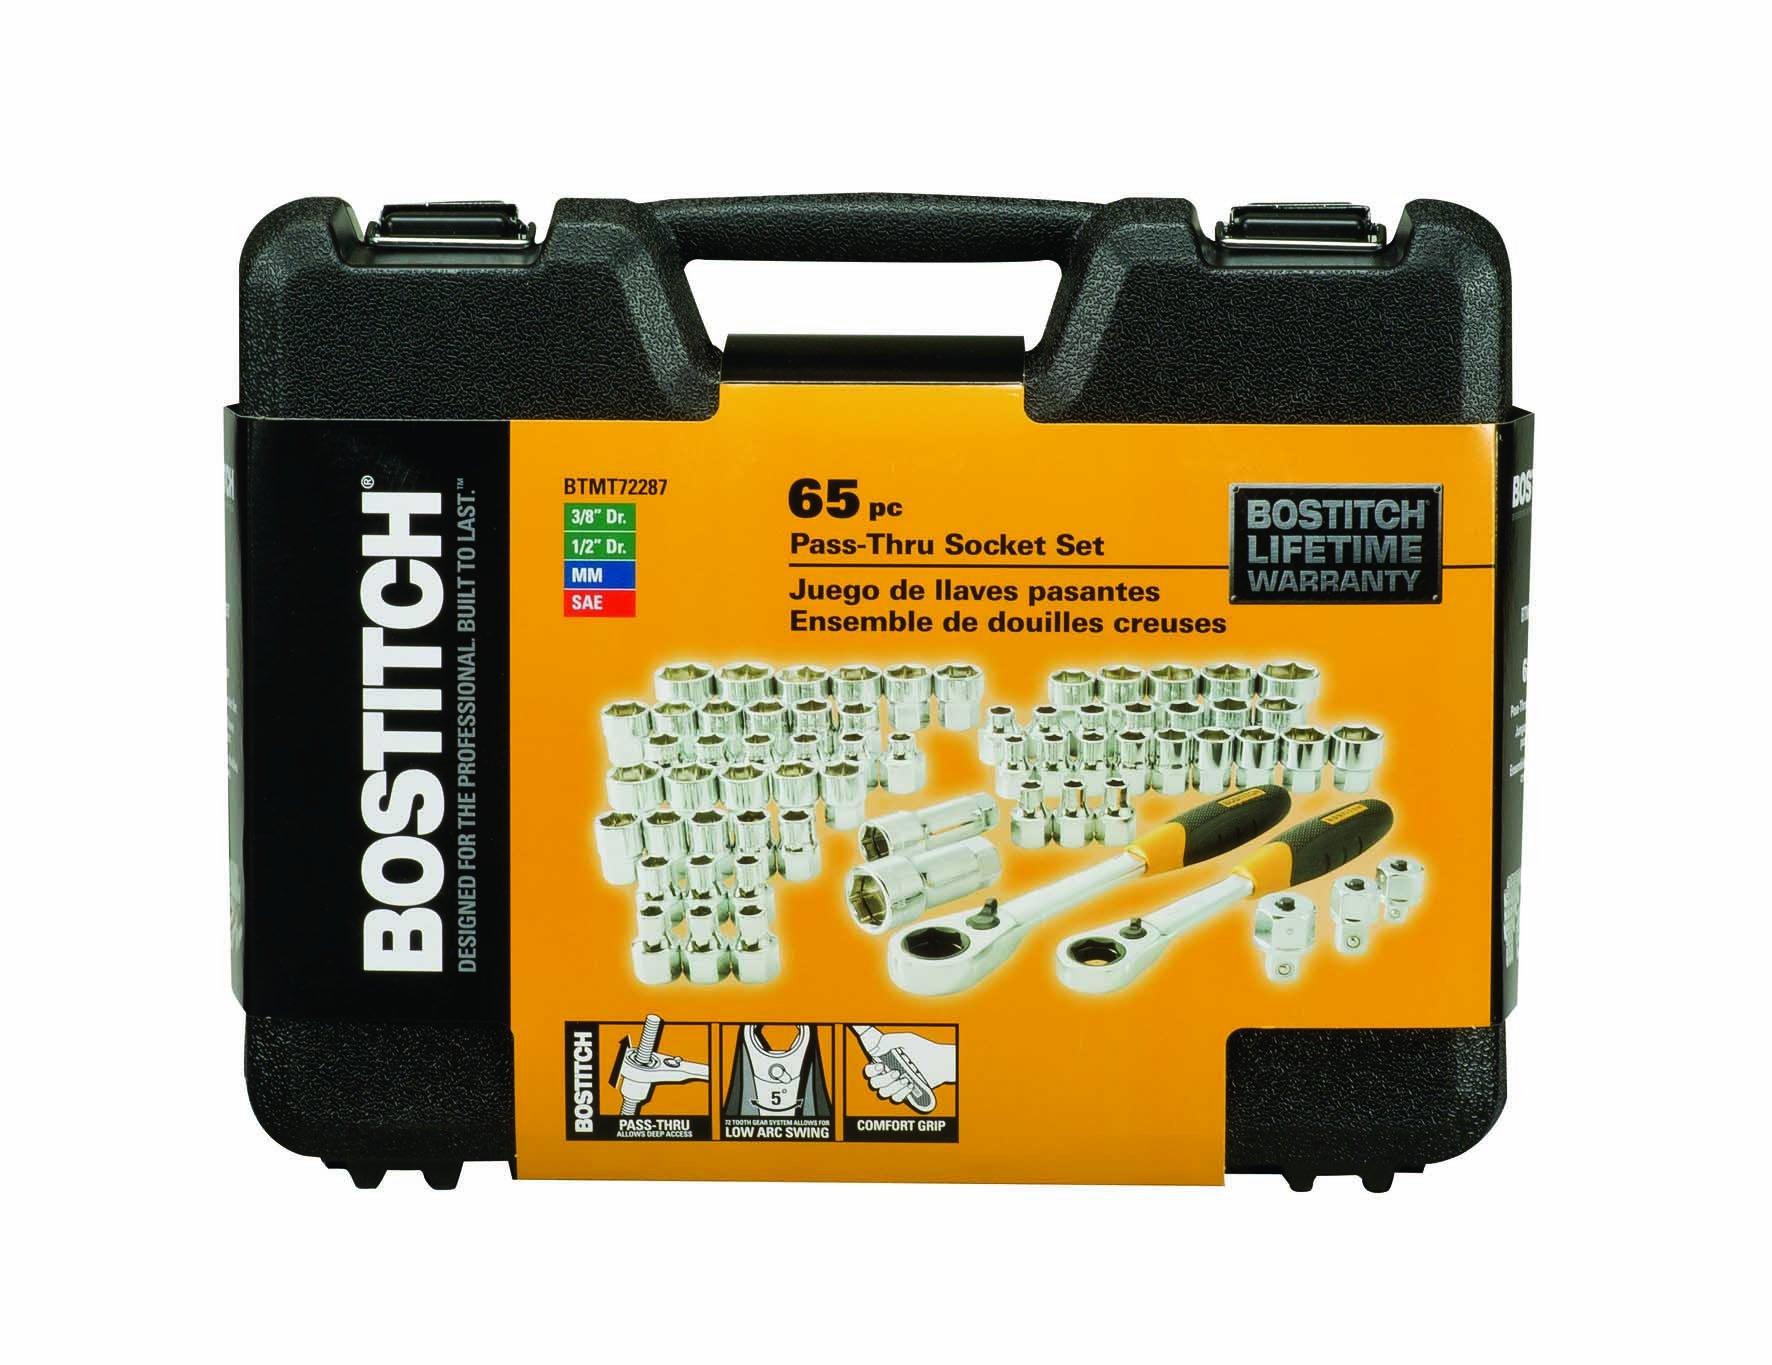 BOSTITCH BTMT72287 Pass Through Socket Set, 65-Piece